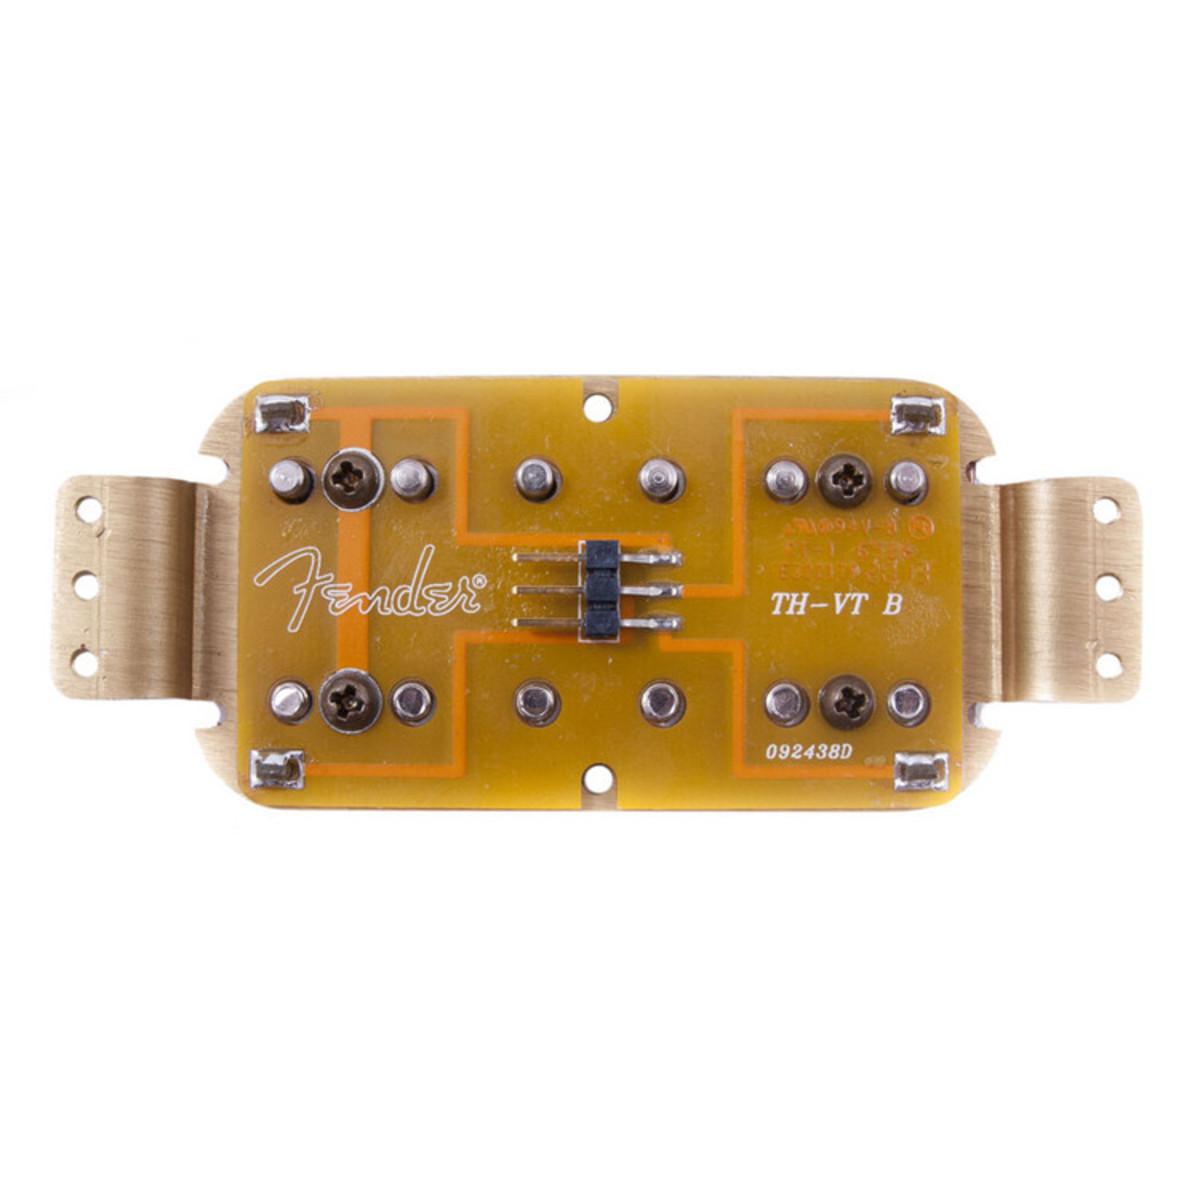 Wiring Diagram Fender Twin Head Humbucker Hsh Mod To Hh Sss Alloutputcom Disc Hb Vintage Bridge Pickup Parchment At